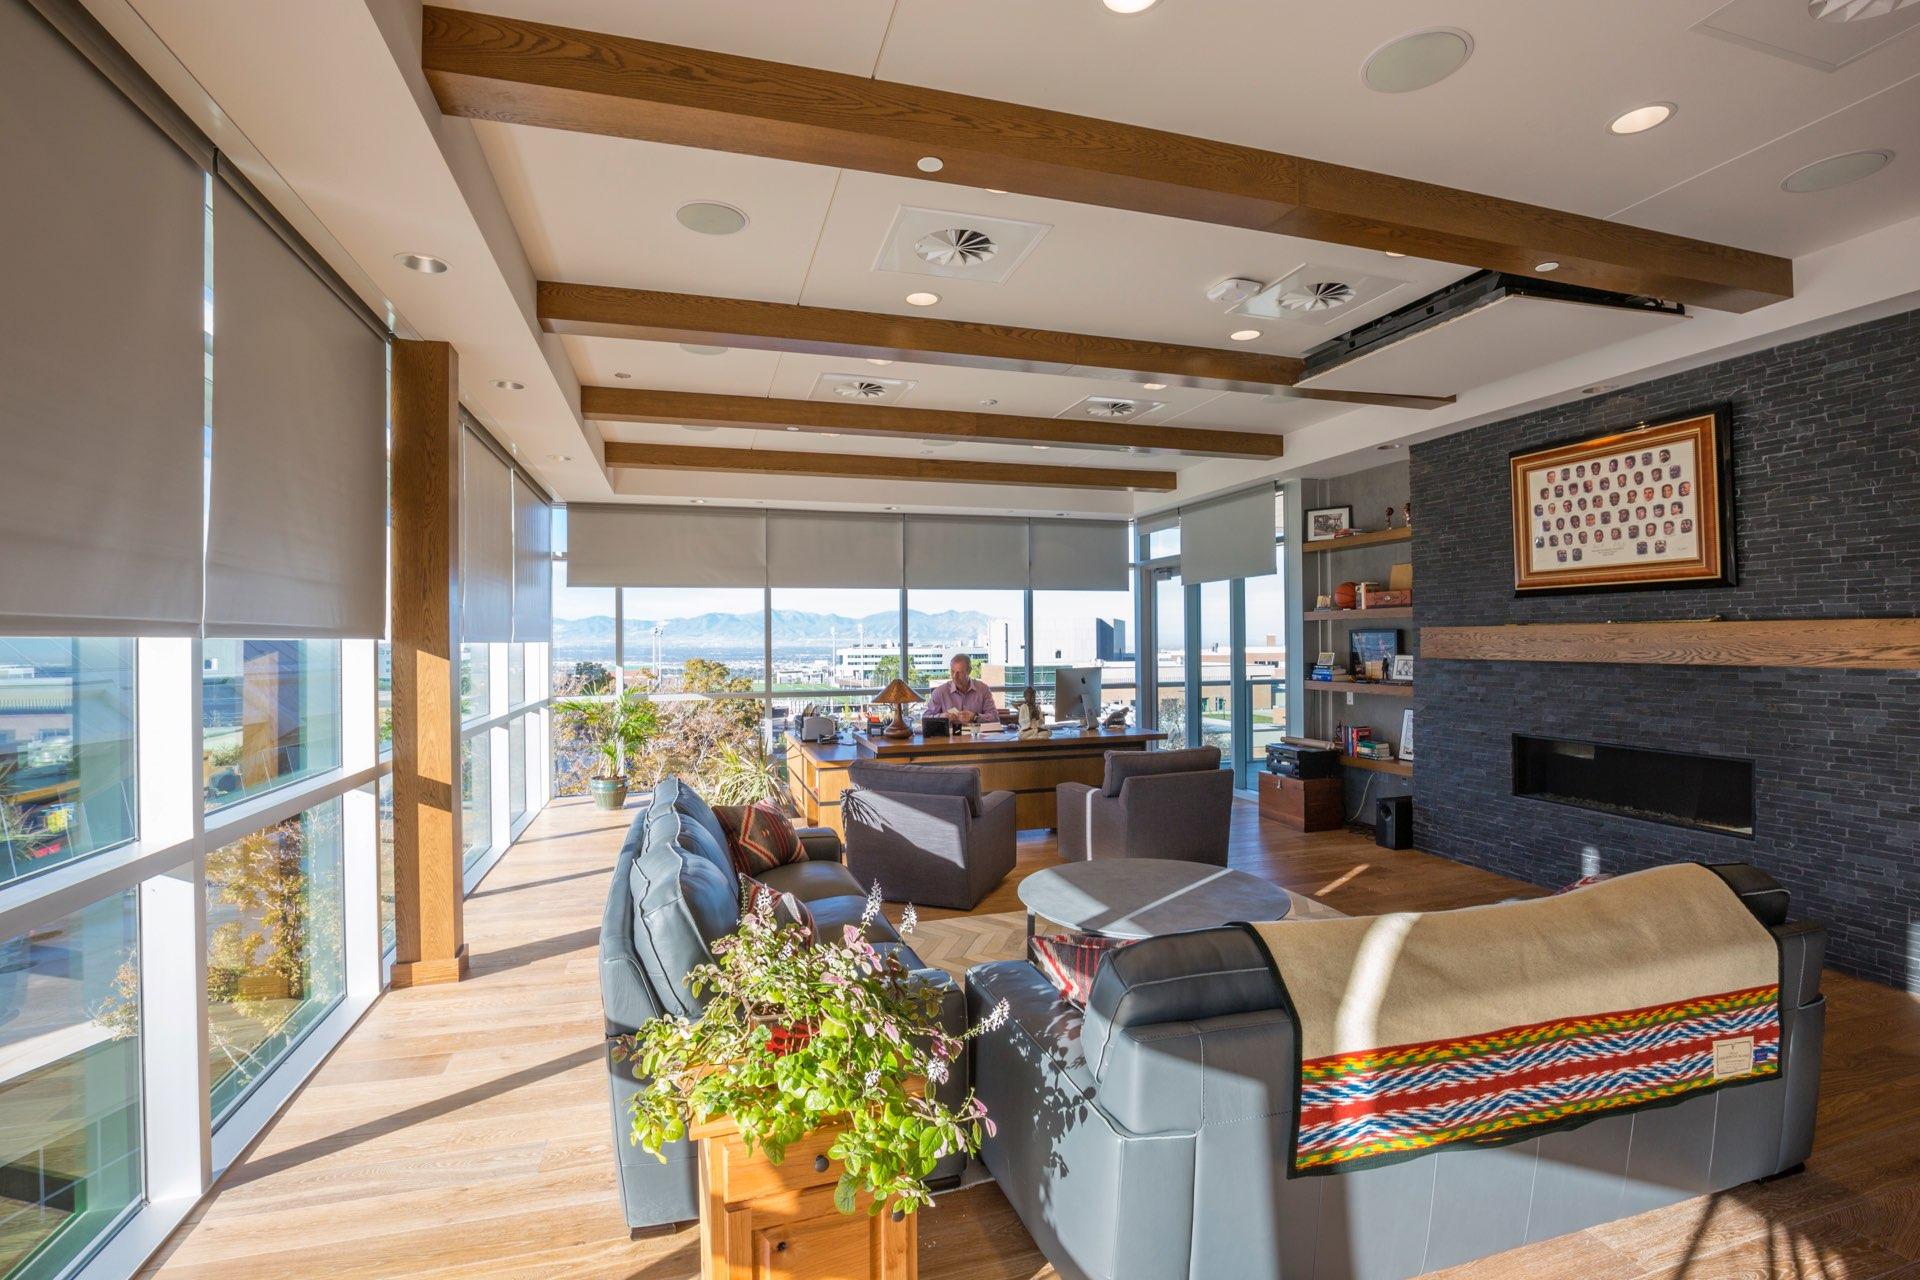 Coach's office inside the University of Utah Basketball Interior, interior design by Elliott Workgroup